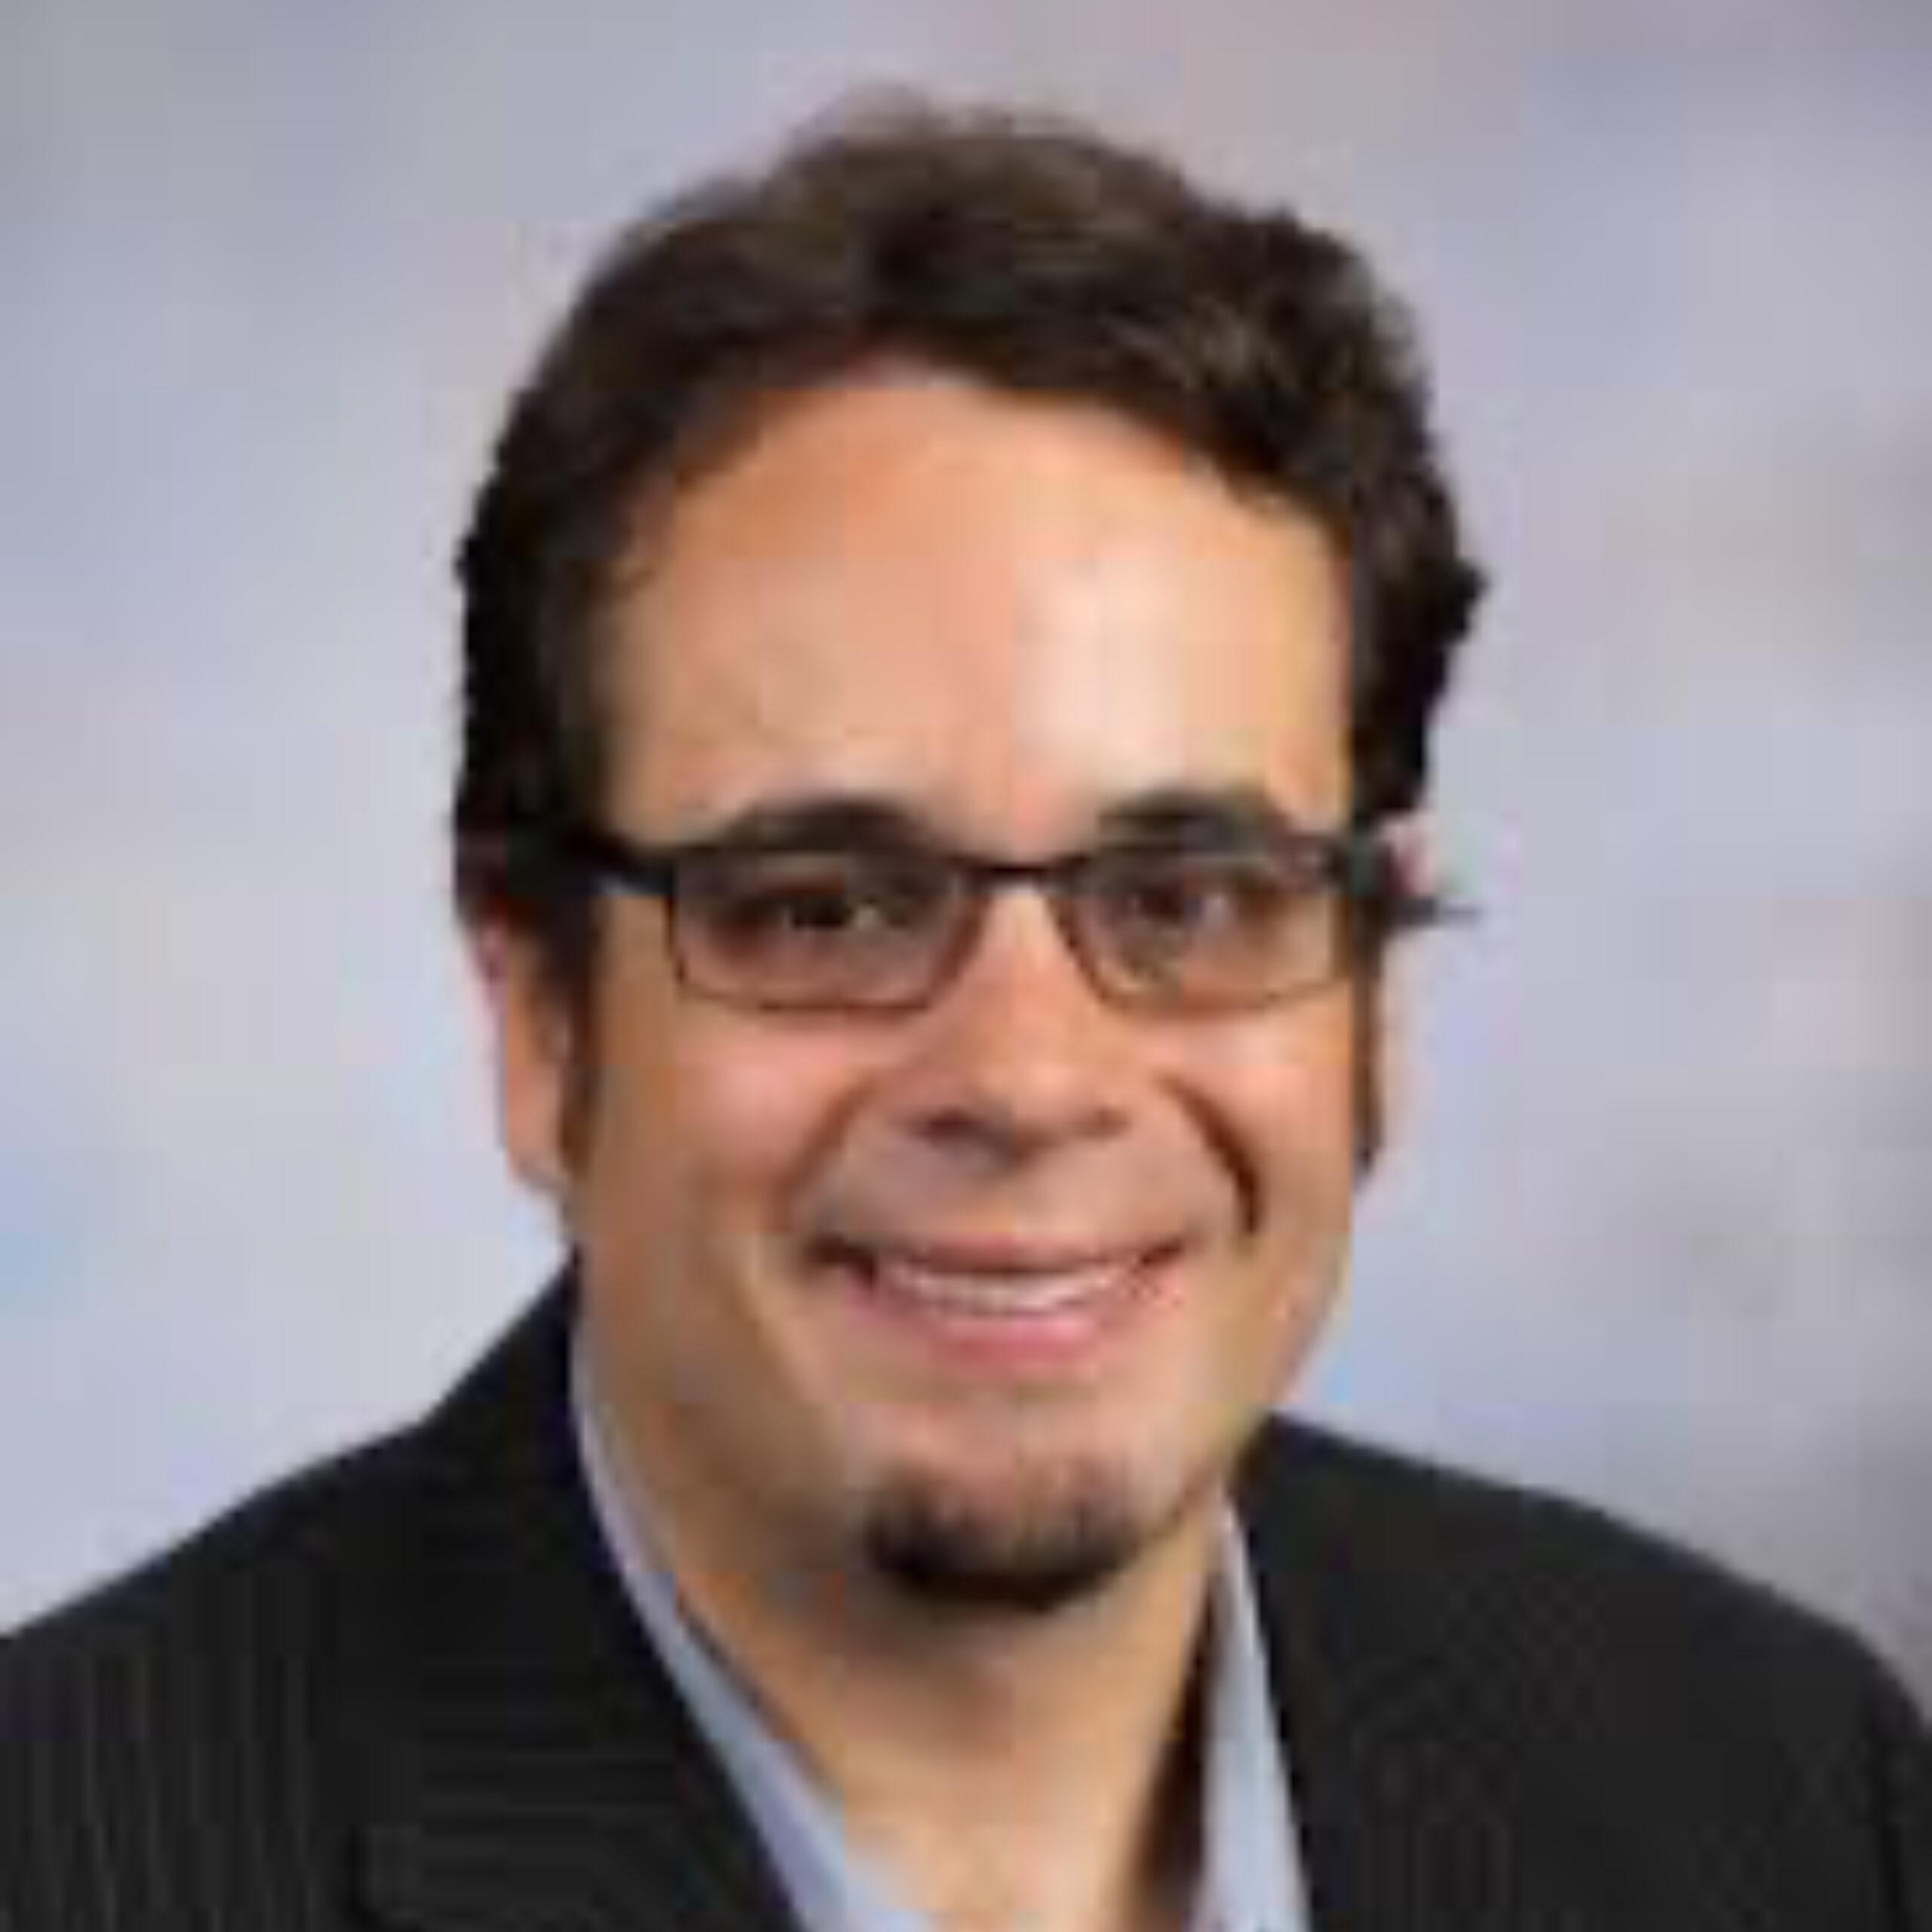 Walter Leite, Ph.D.